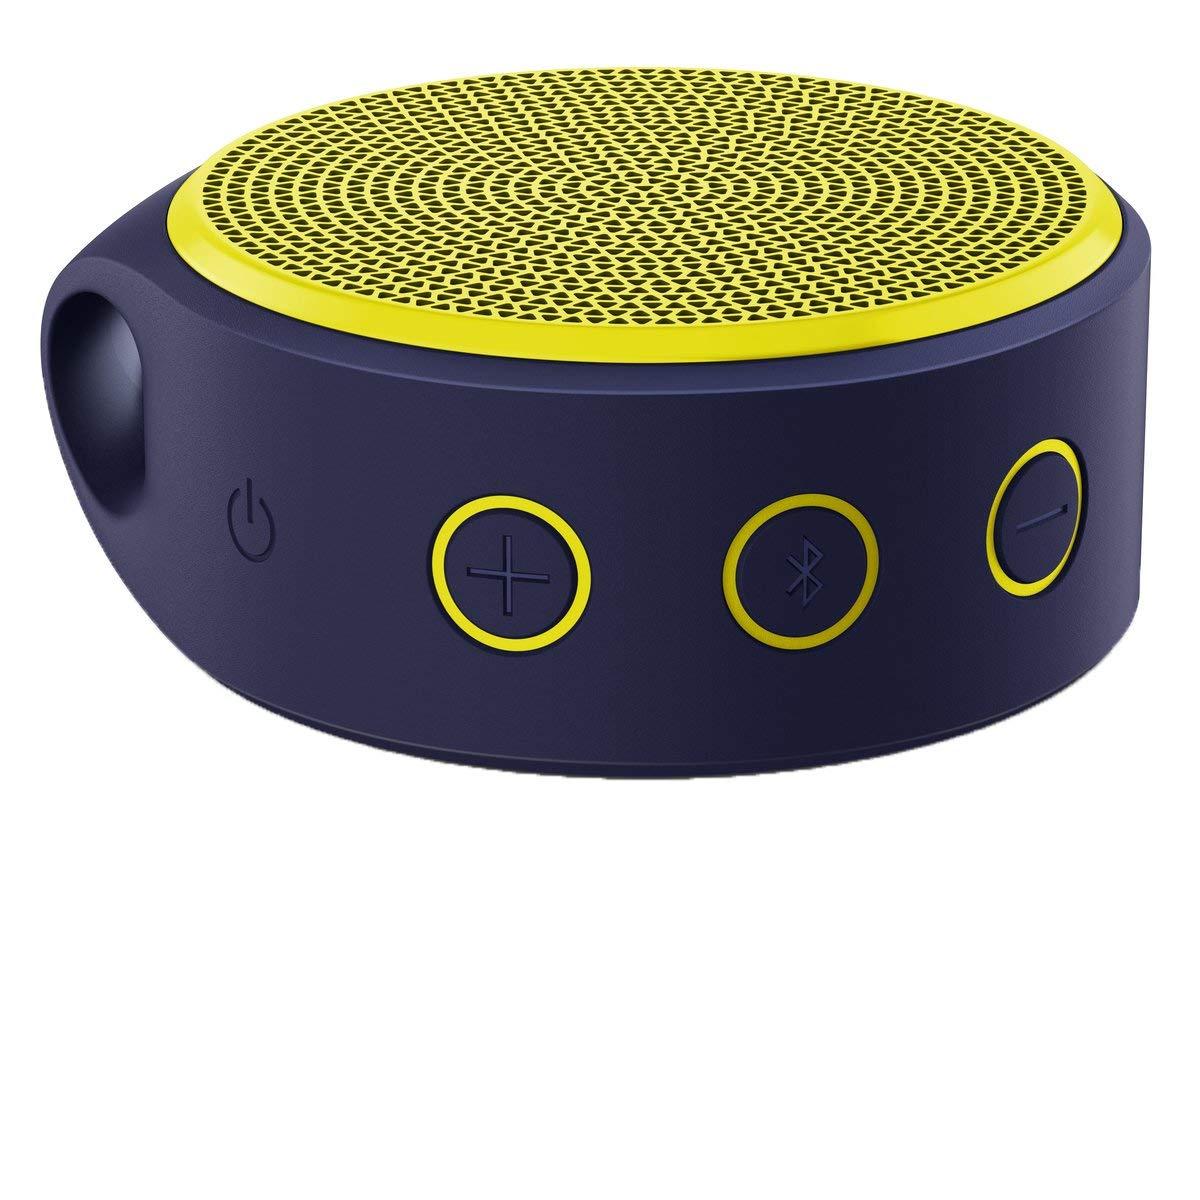 La mini enceinte Bluetooth Logitech X100